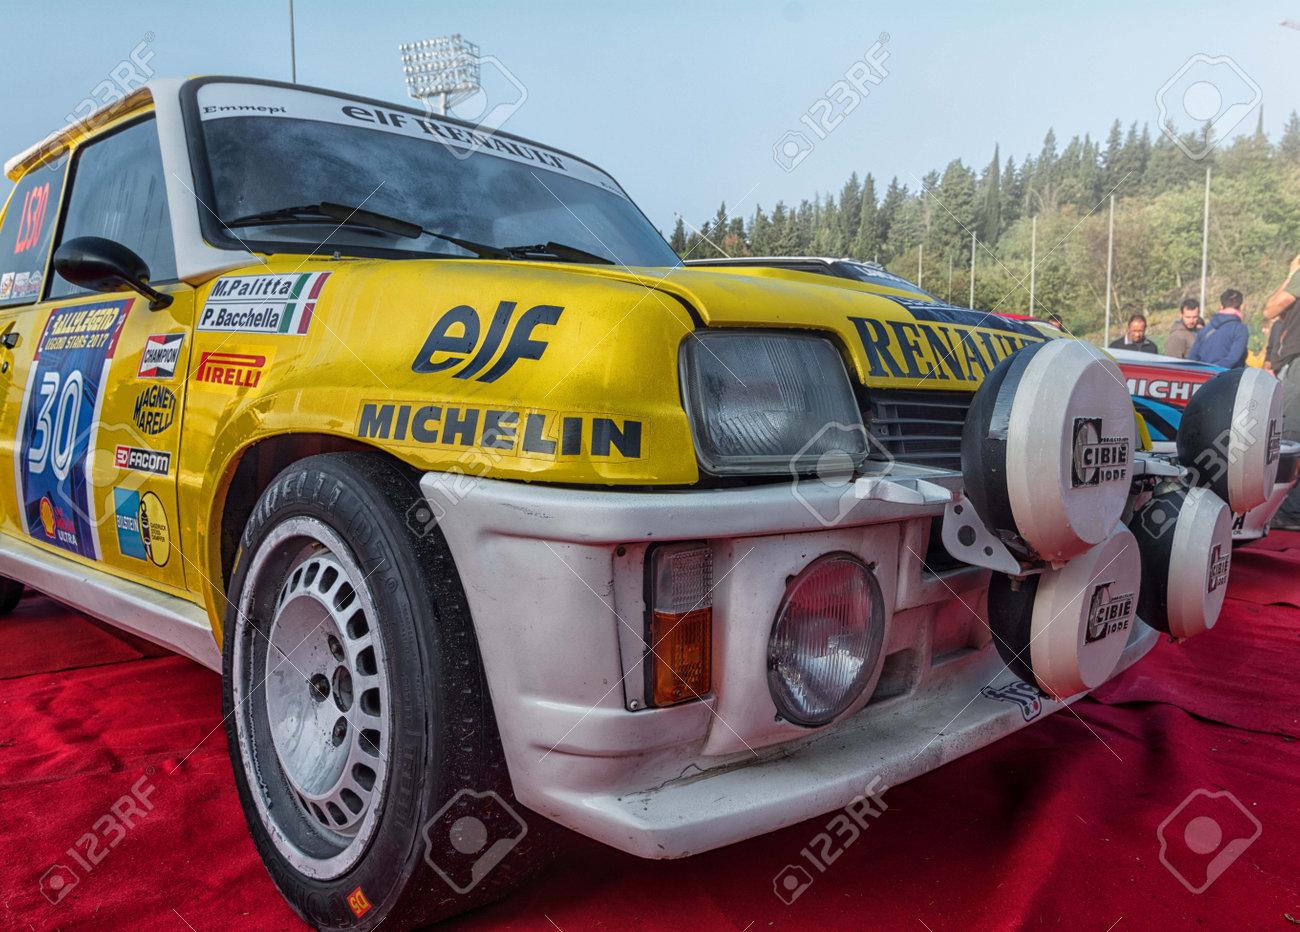 Sanmarino Sanmarino Oct 21 2017 Renault 5 Gt Turbo 1982 Stock Photo Picture And Royalty Free Image Image 101775029